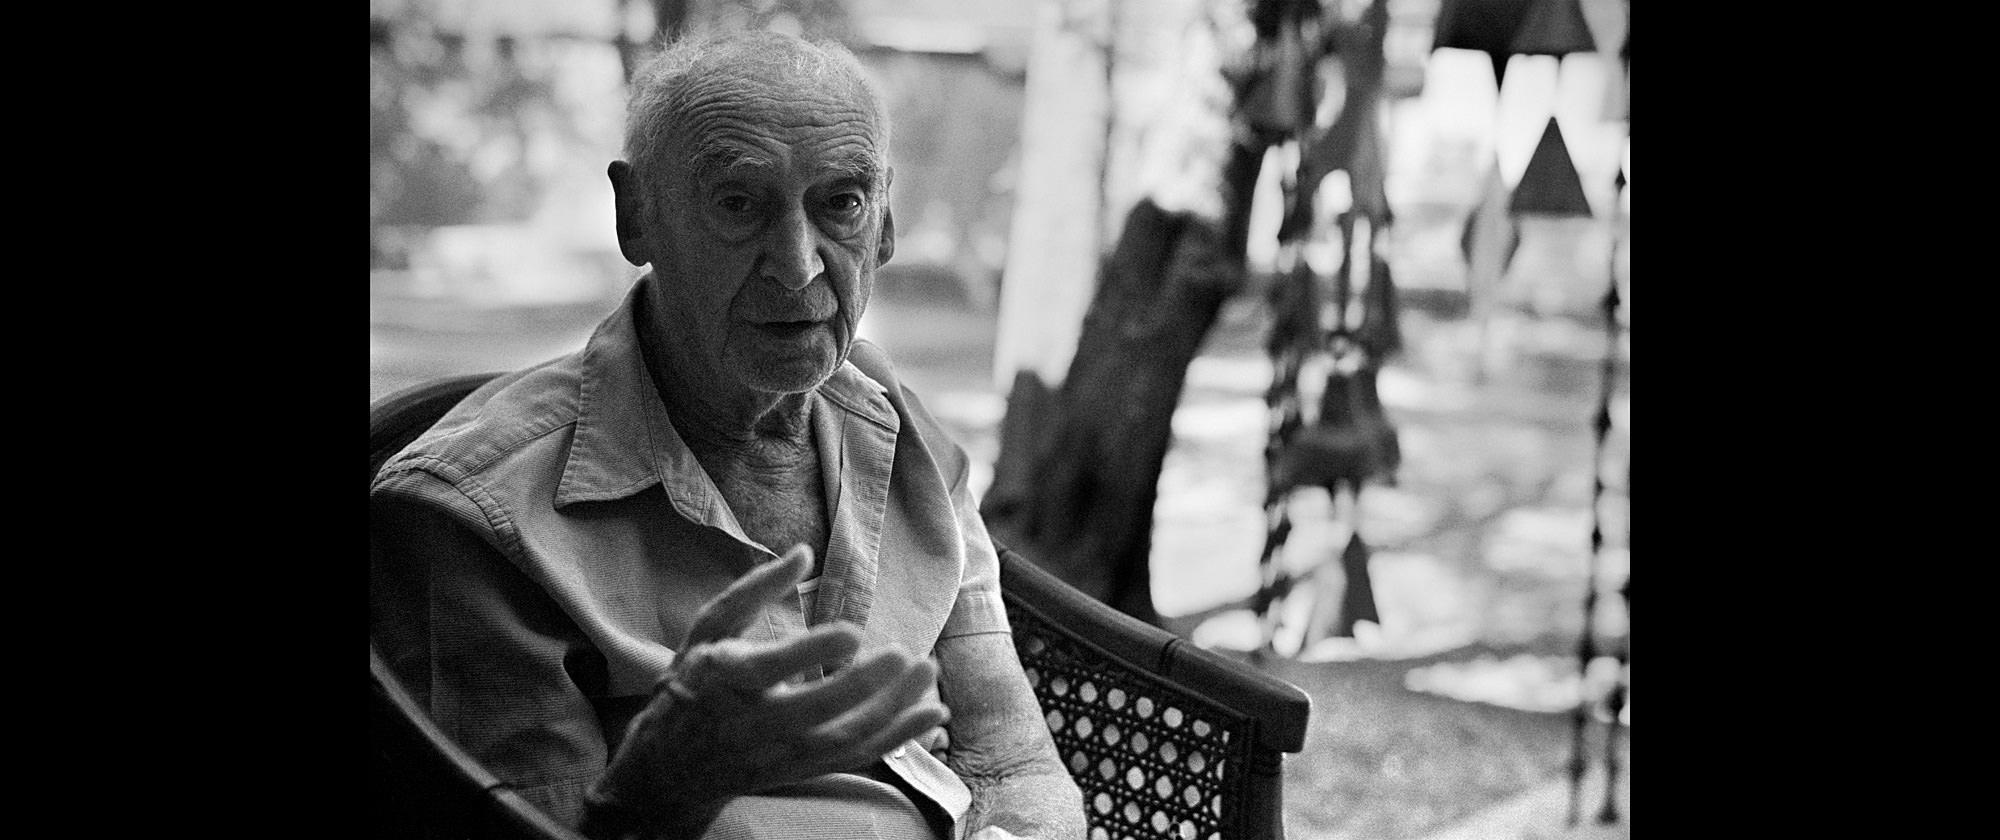 Paolo Soleri (USA, 2010)